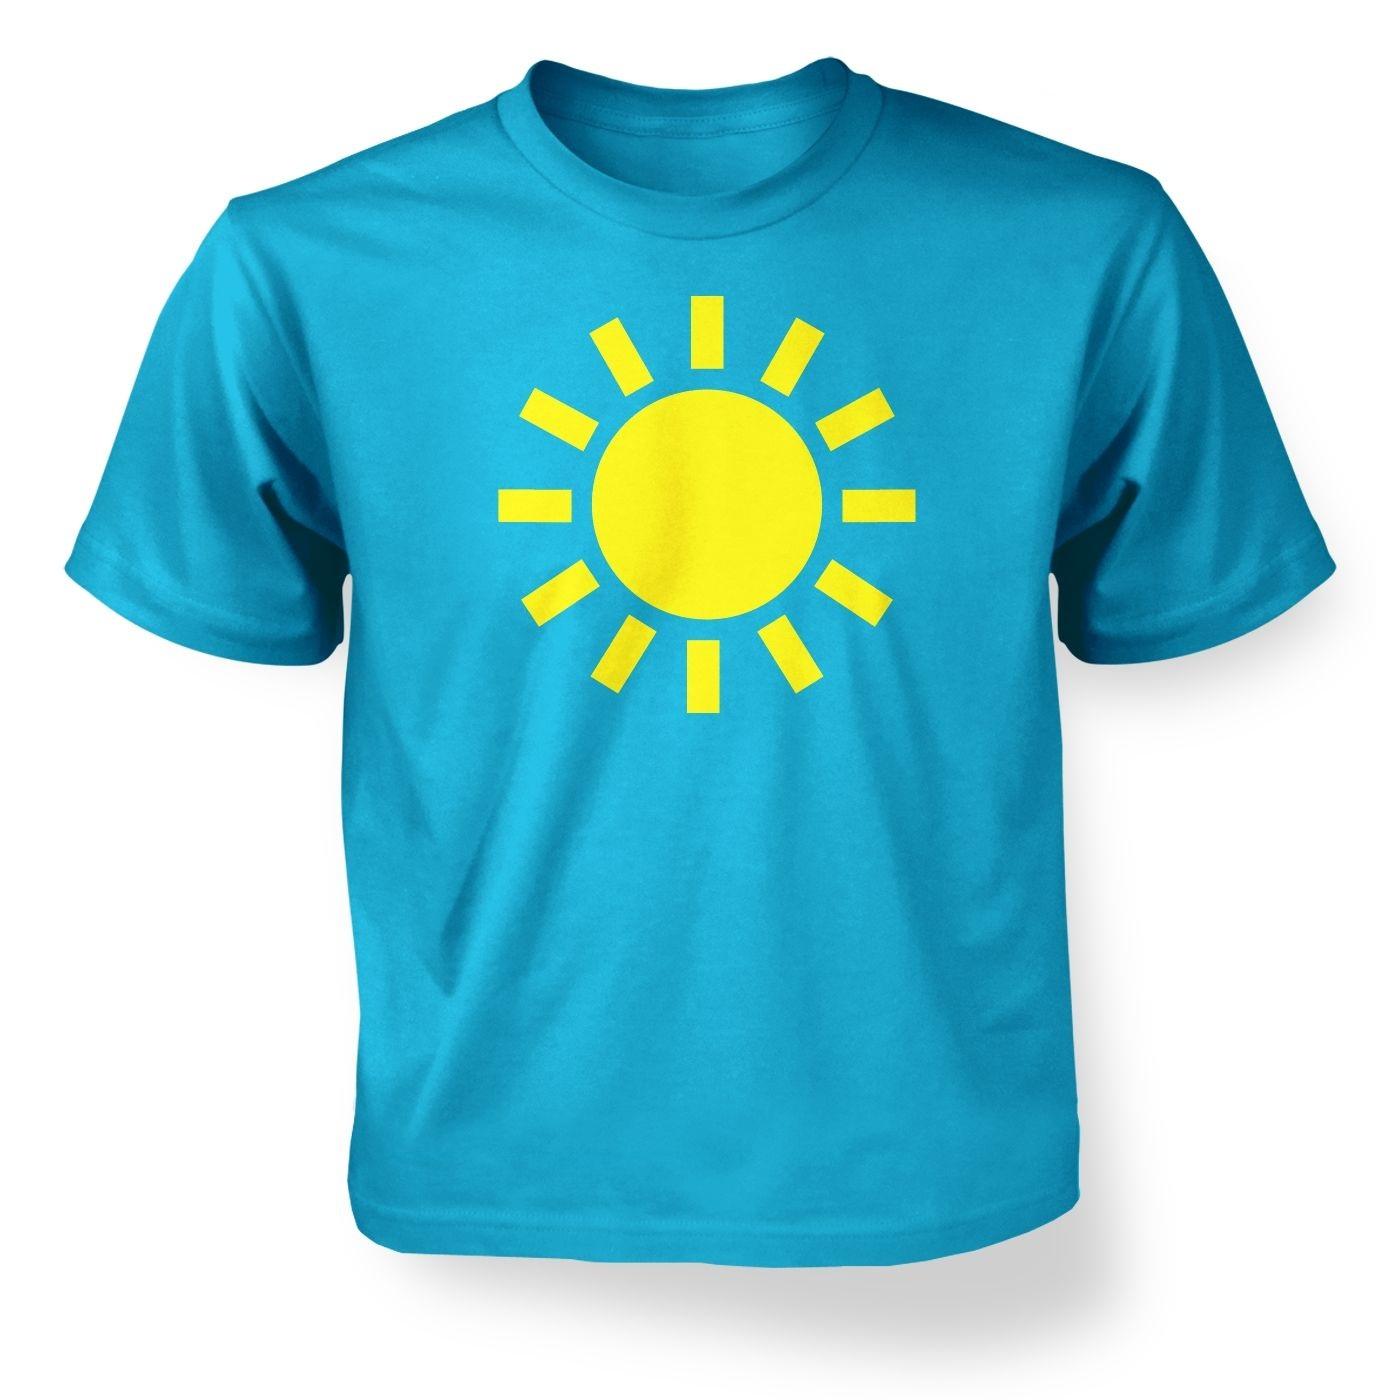 Weather symbol sunny kids t shirt somethinggeeky kids weather symbol sunny t shirt buycottarizona